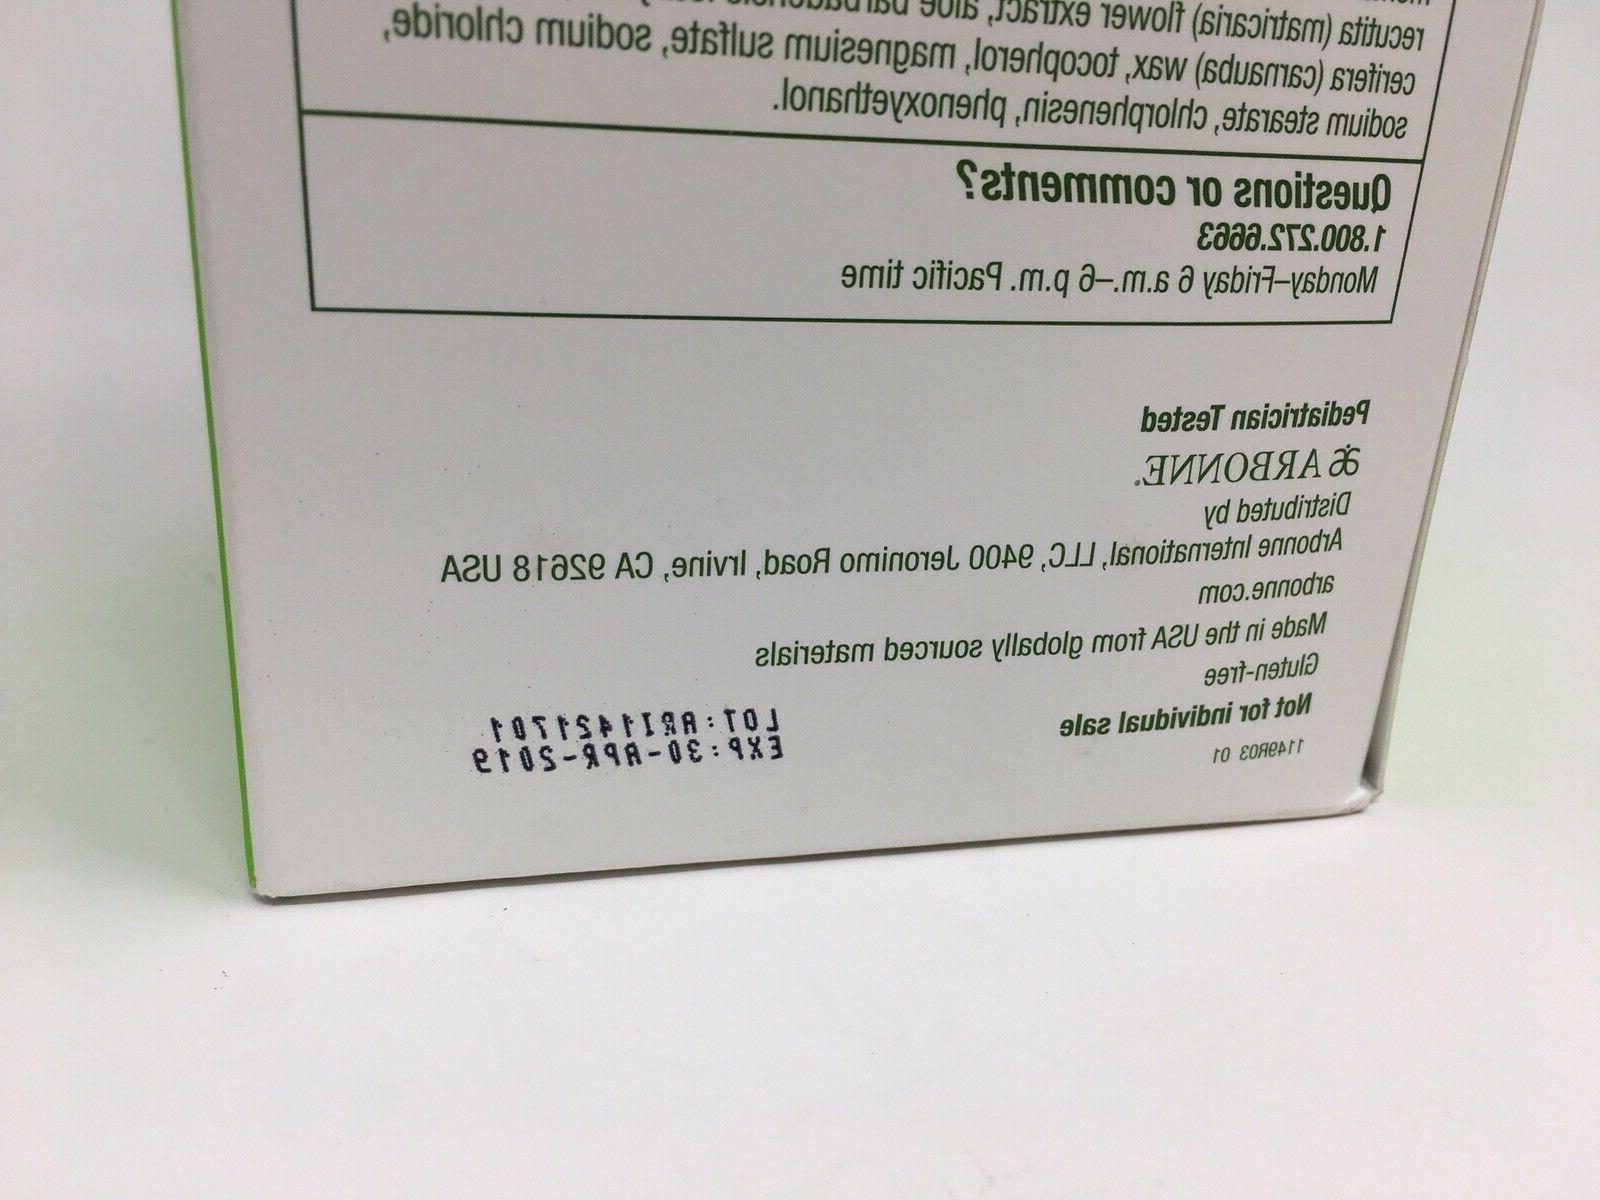 ABC Care: Sunscreen Cream Lotion EXPIRED